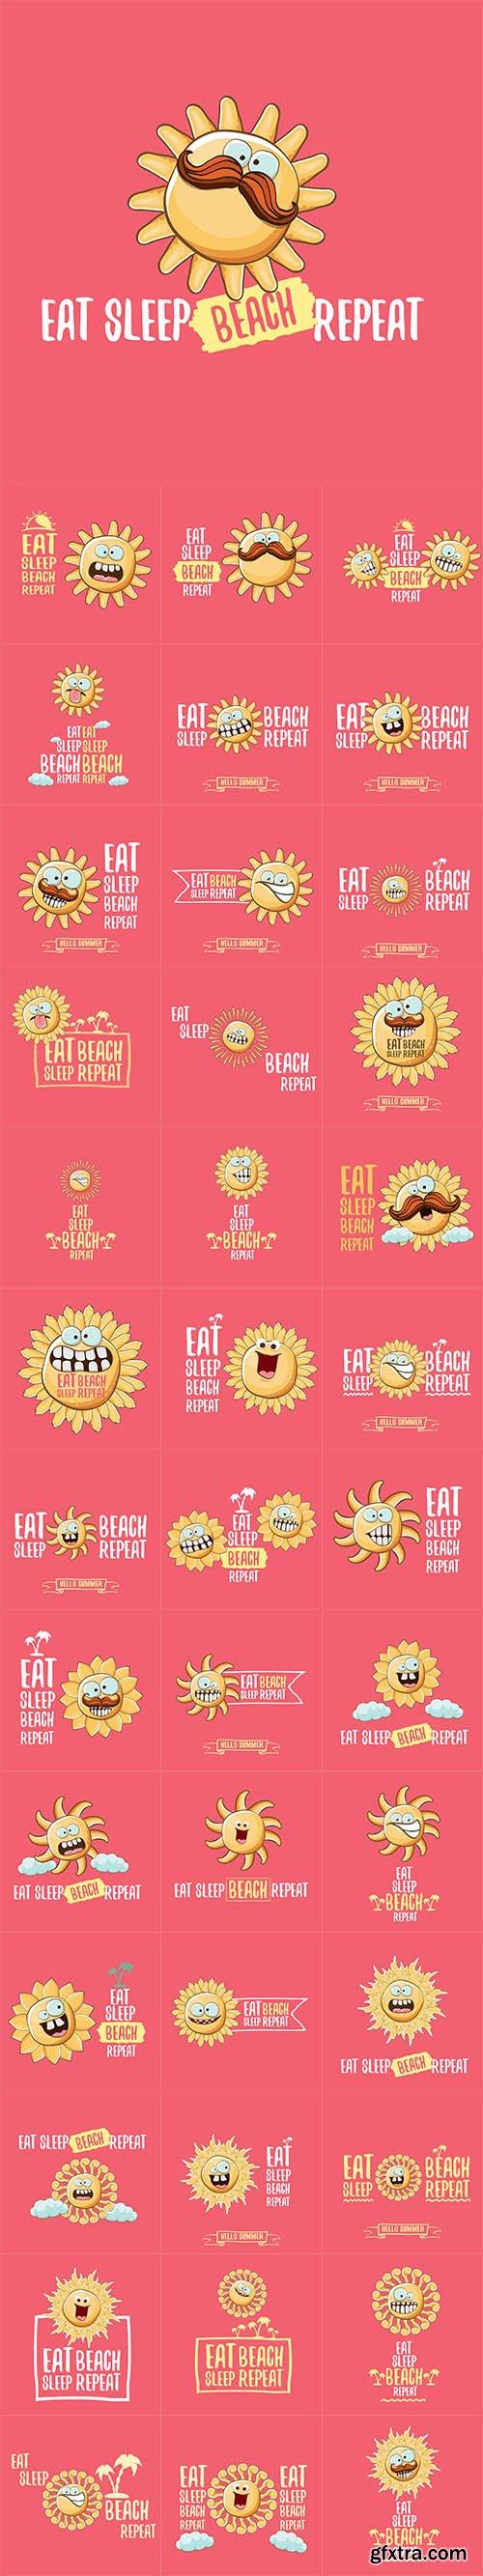 Vector Set - Eat sleep beach repeat concept cartoon illustration or summer poster